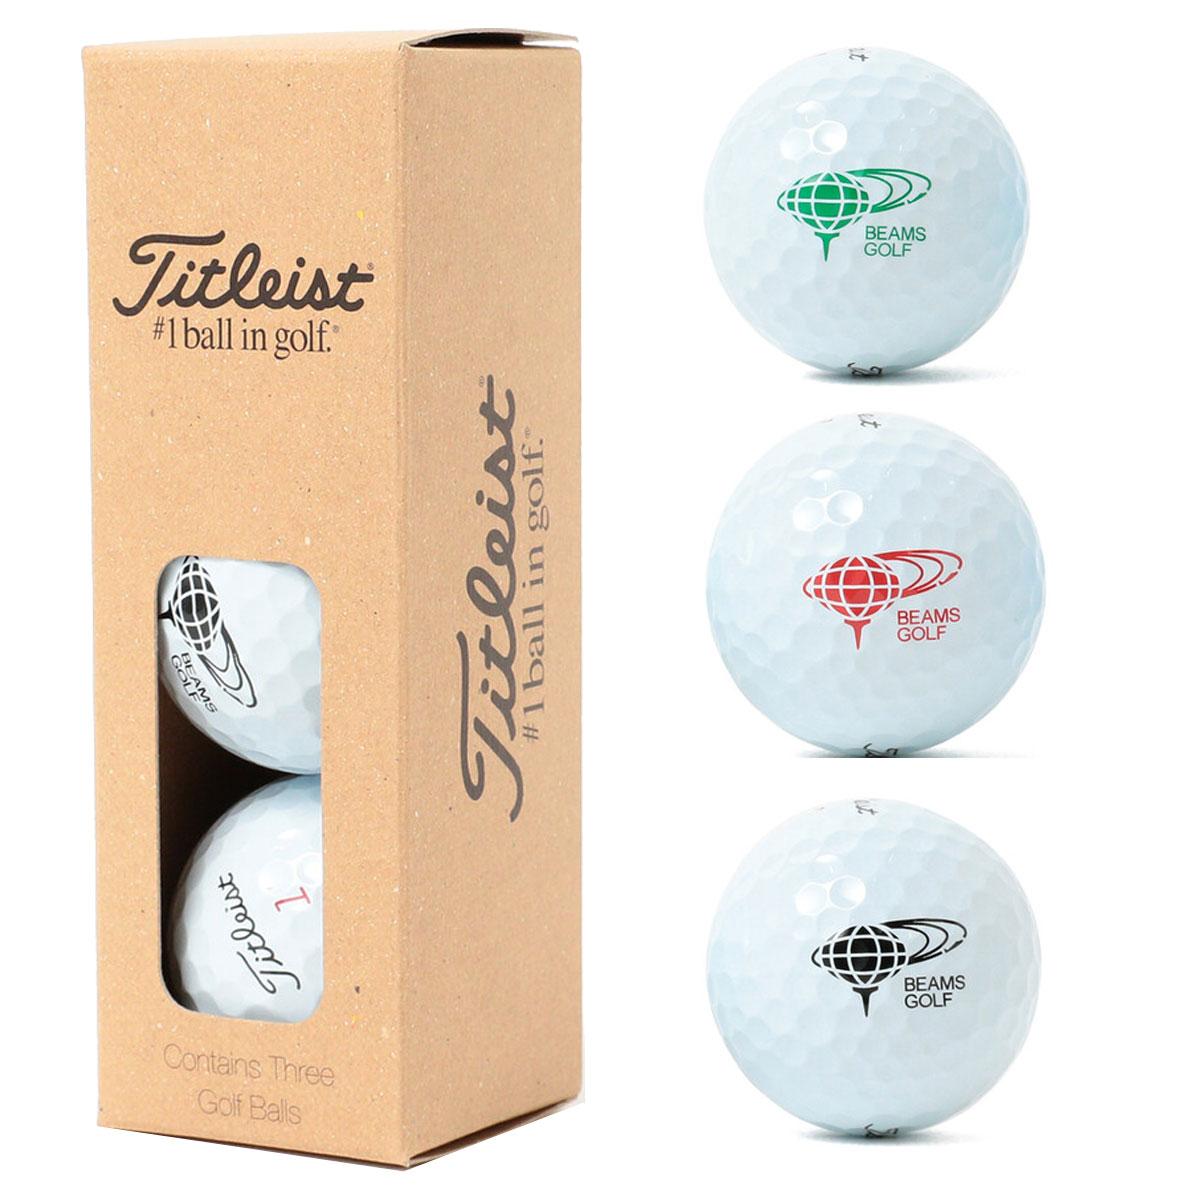 Titleist×BEAMS GOLF Pro V1x ゴルフボール